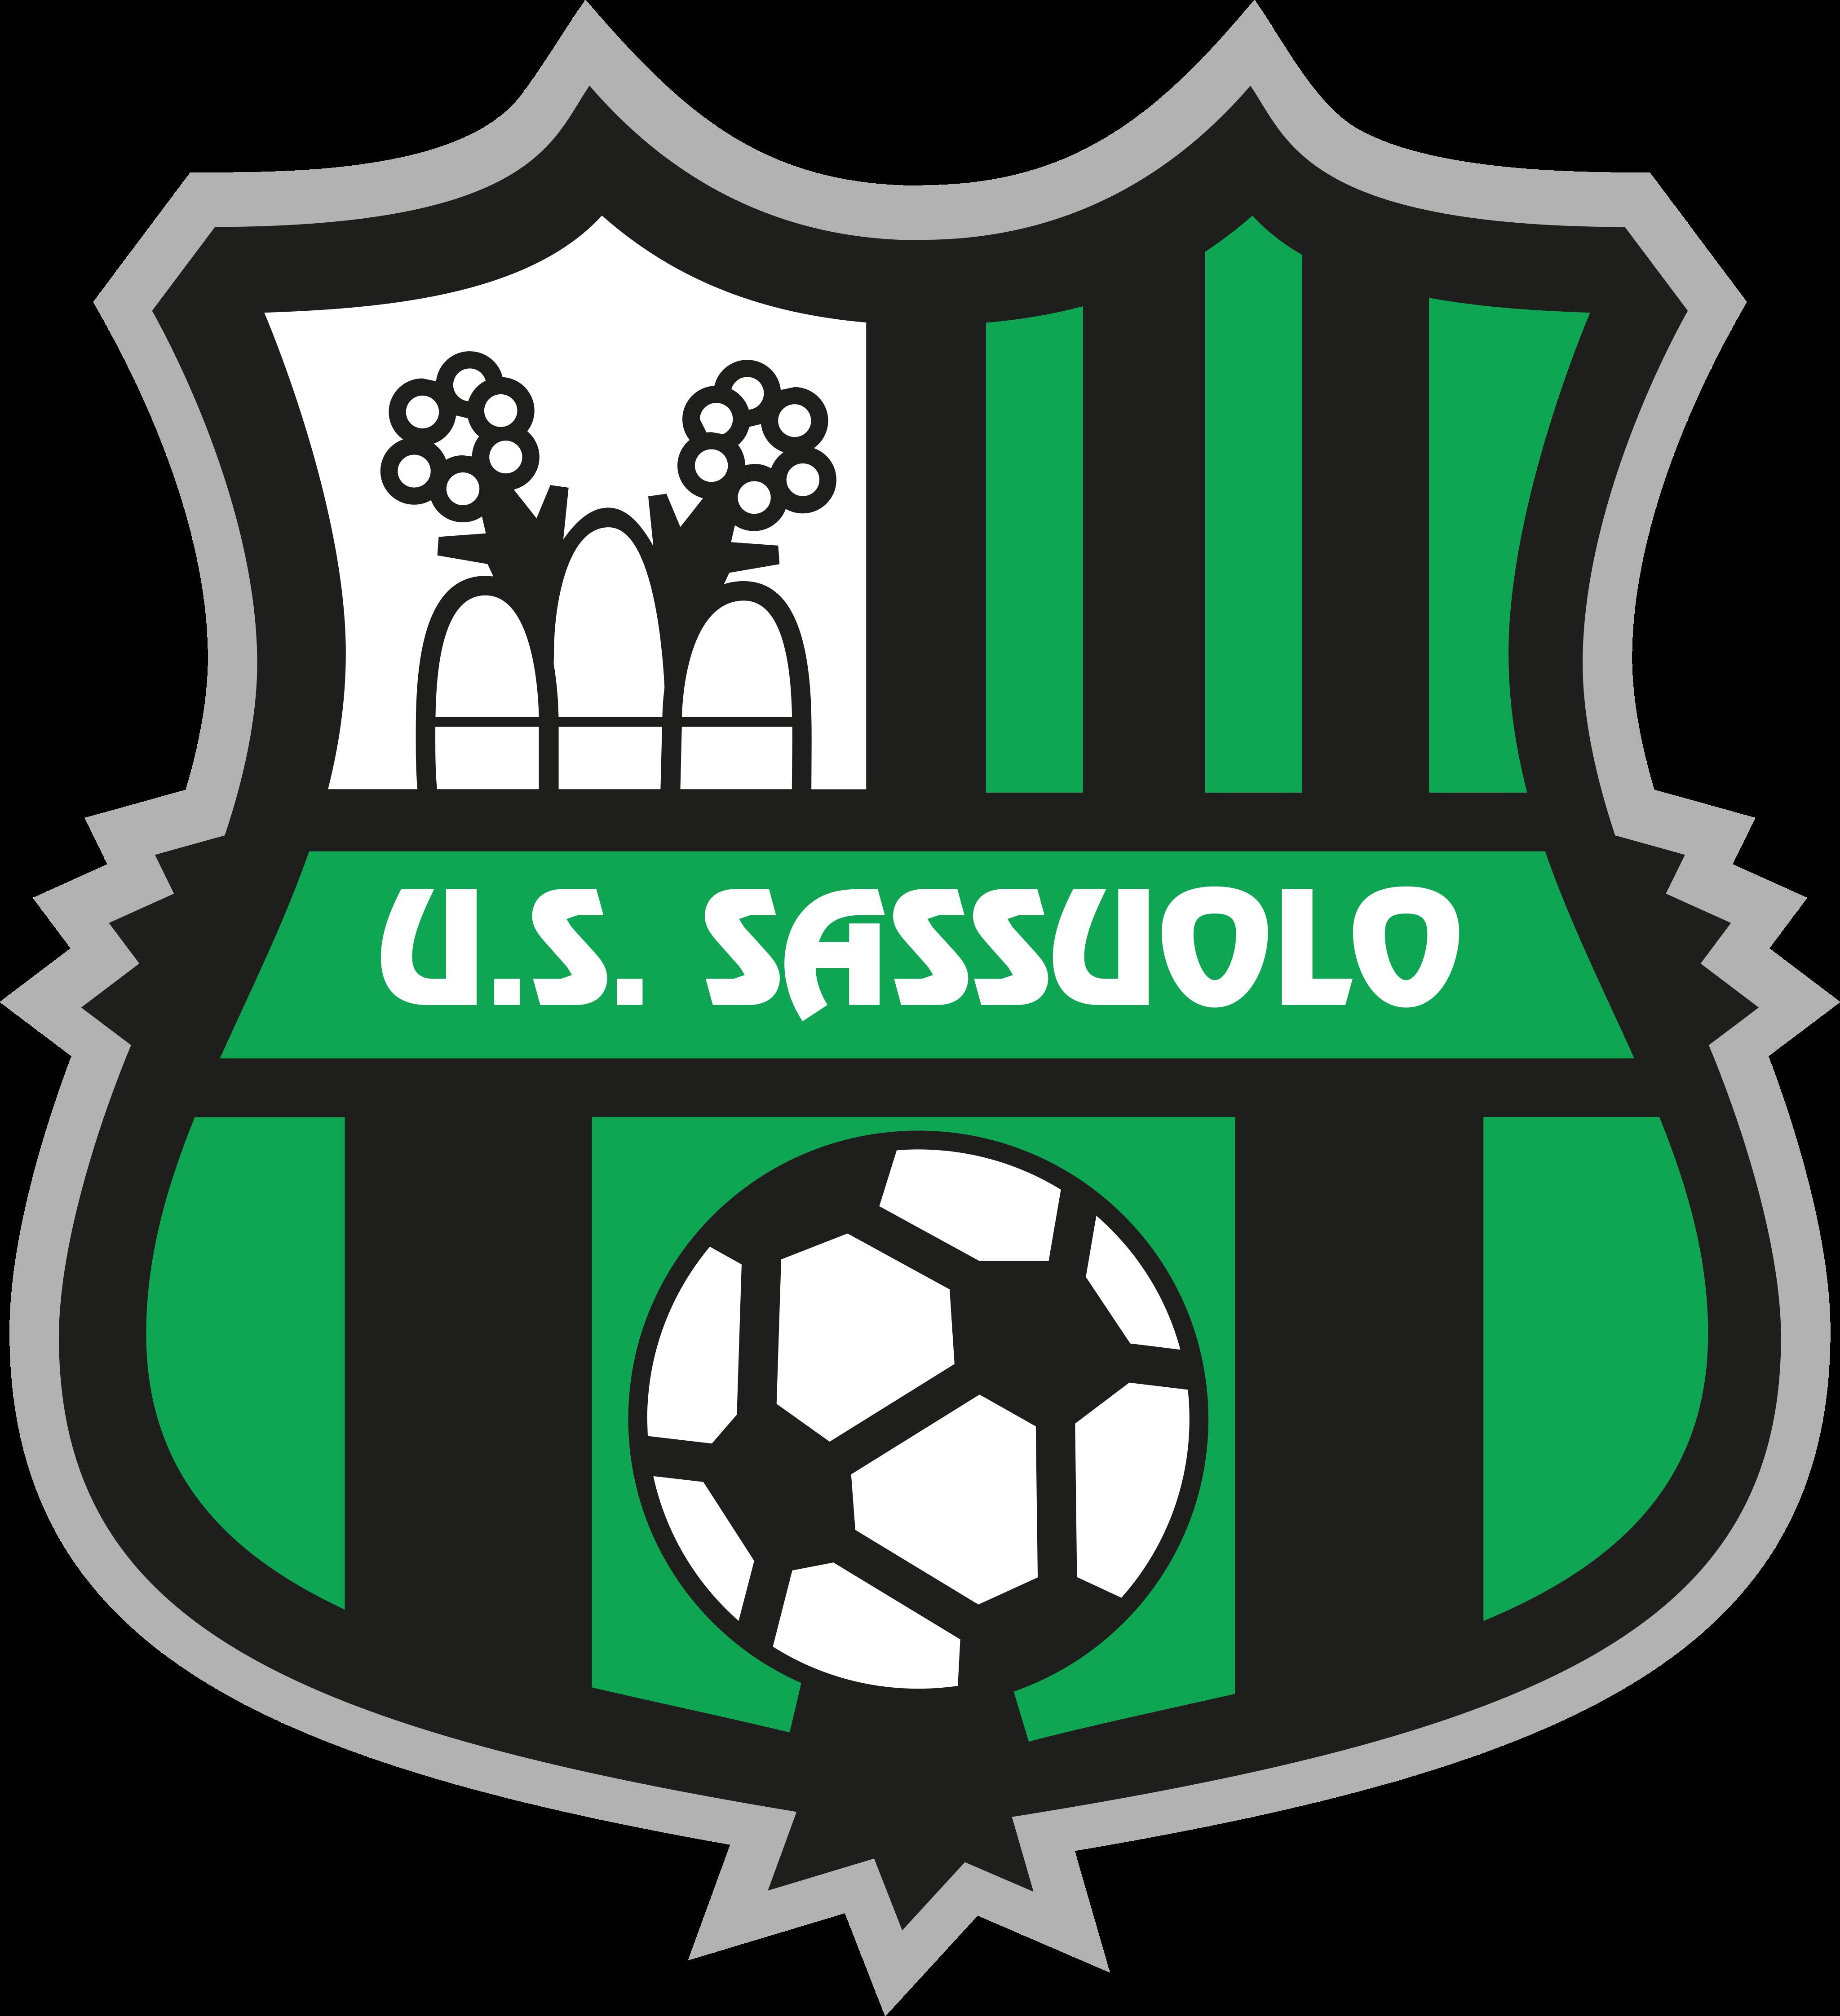 sassuolo calcio logo - Sassuolo Calcio Logo